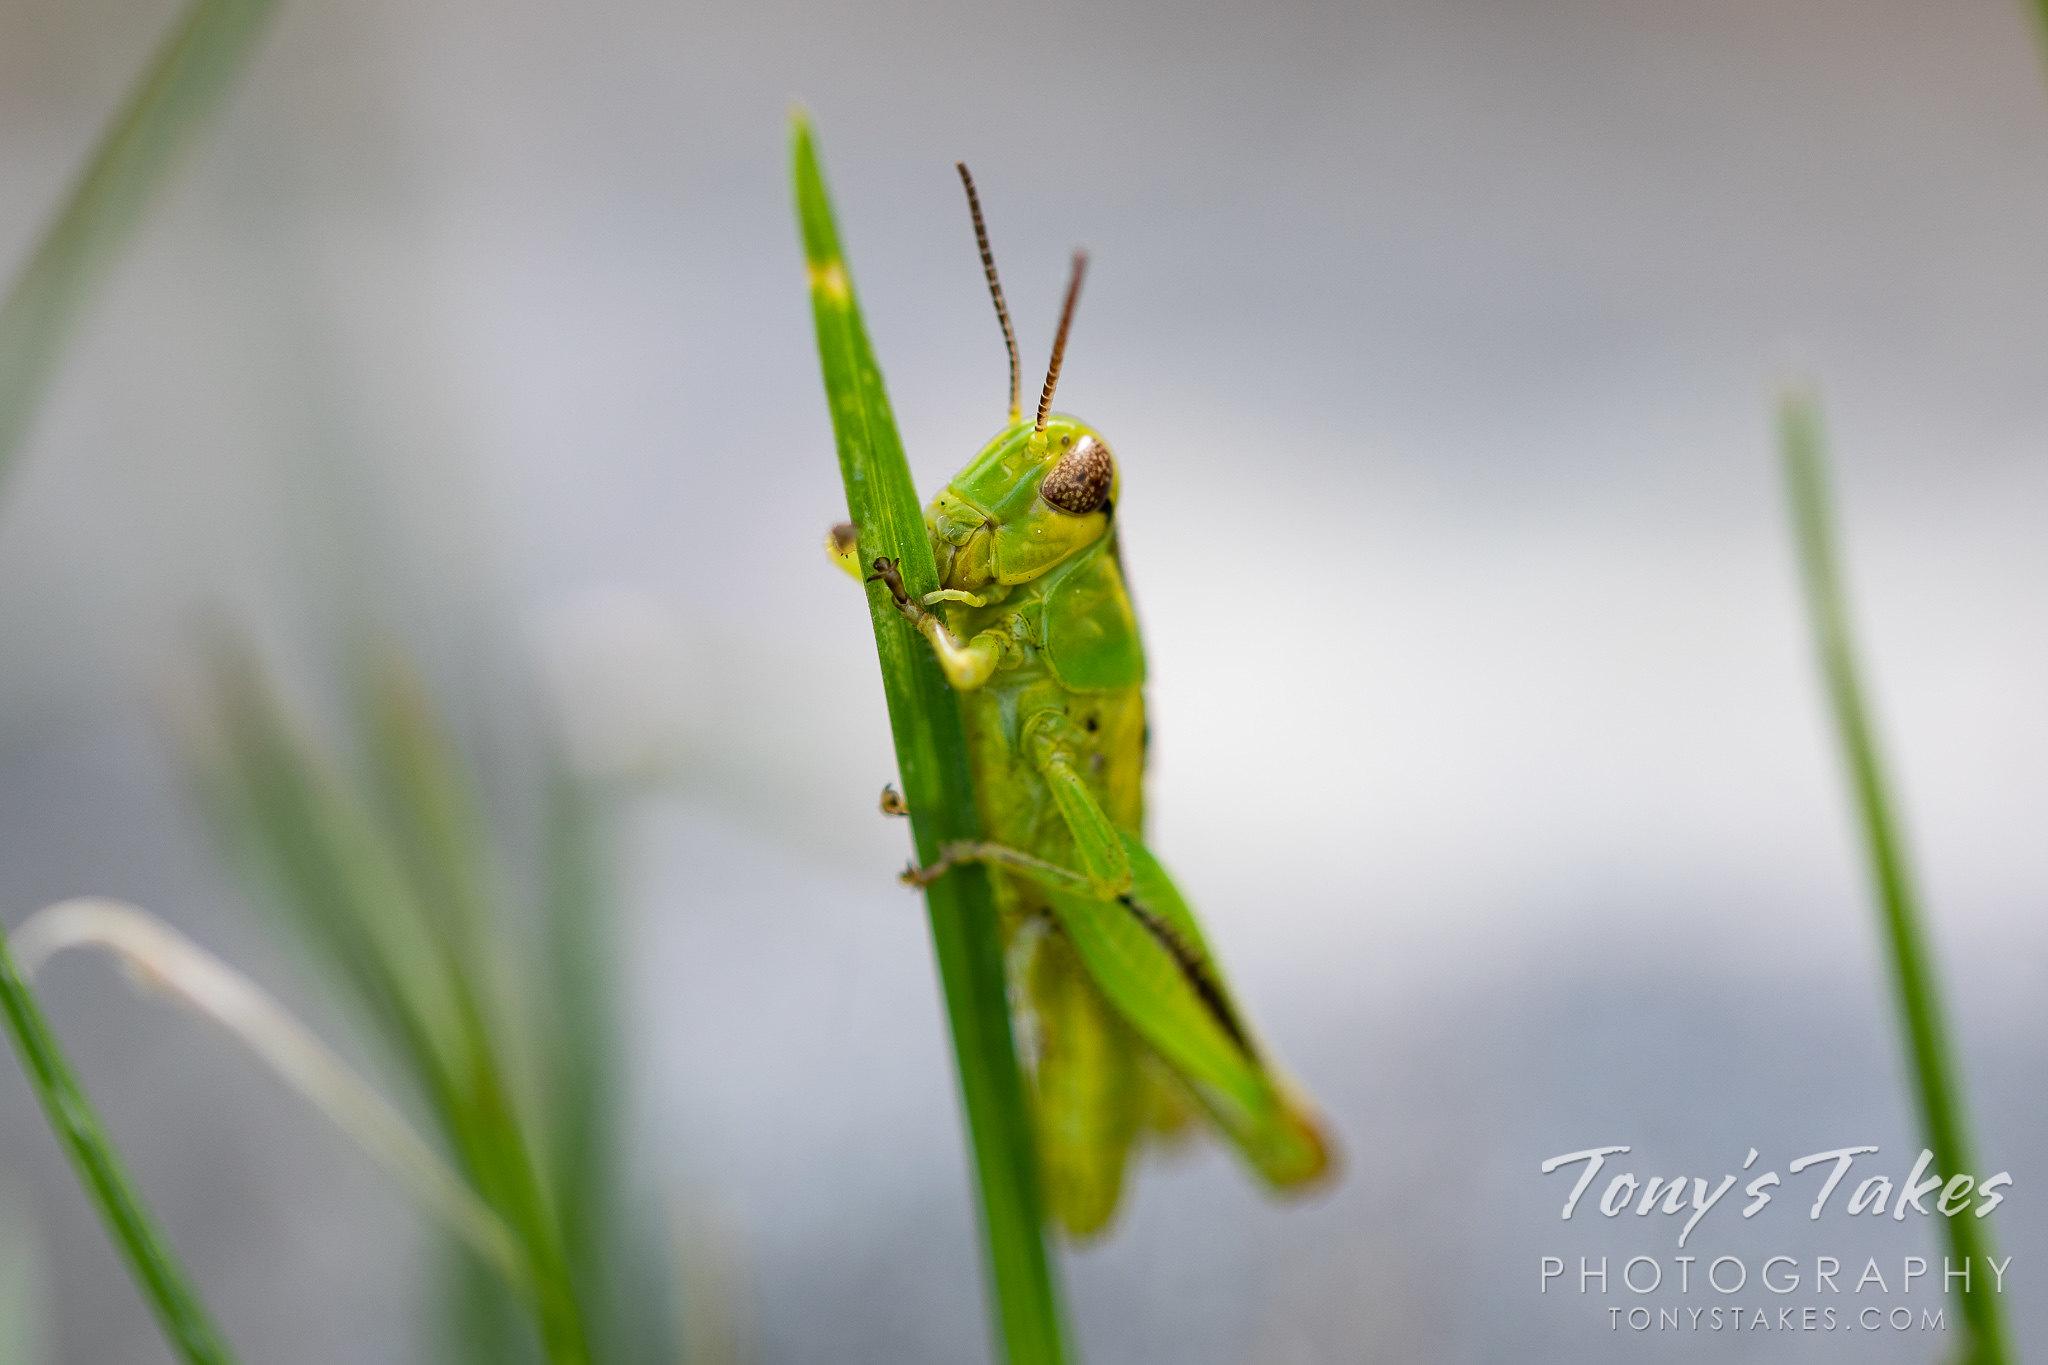 Tiny grasshopper clings to a blade of grass